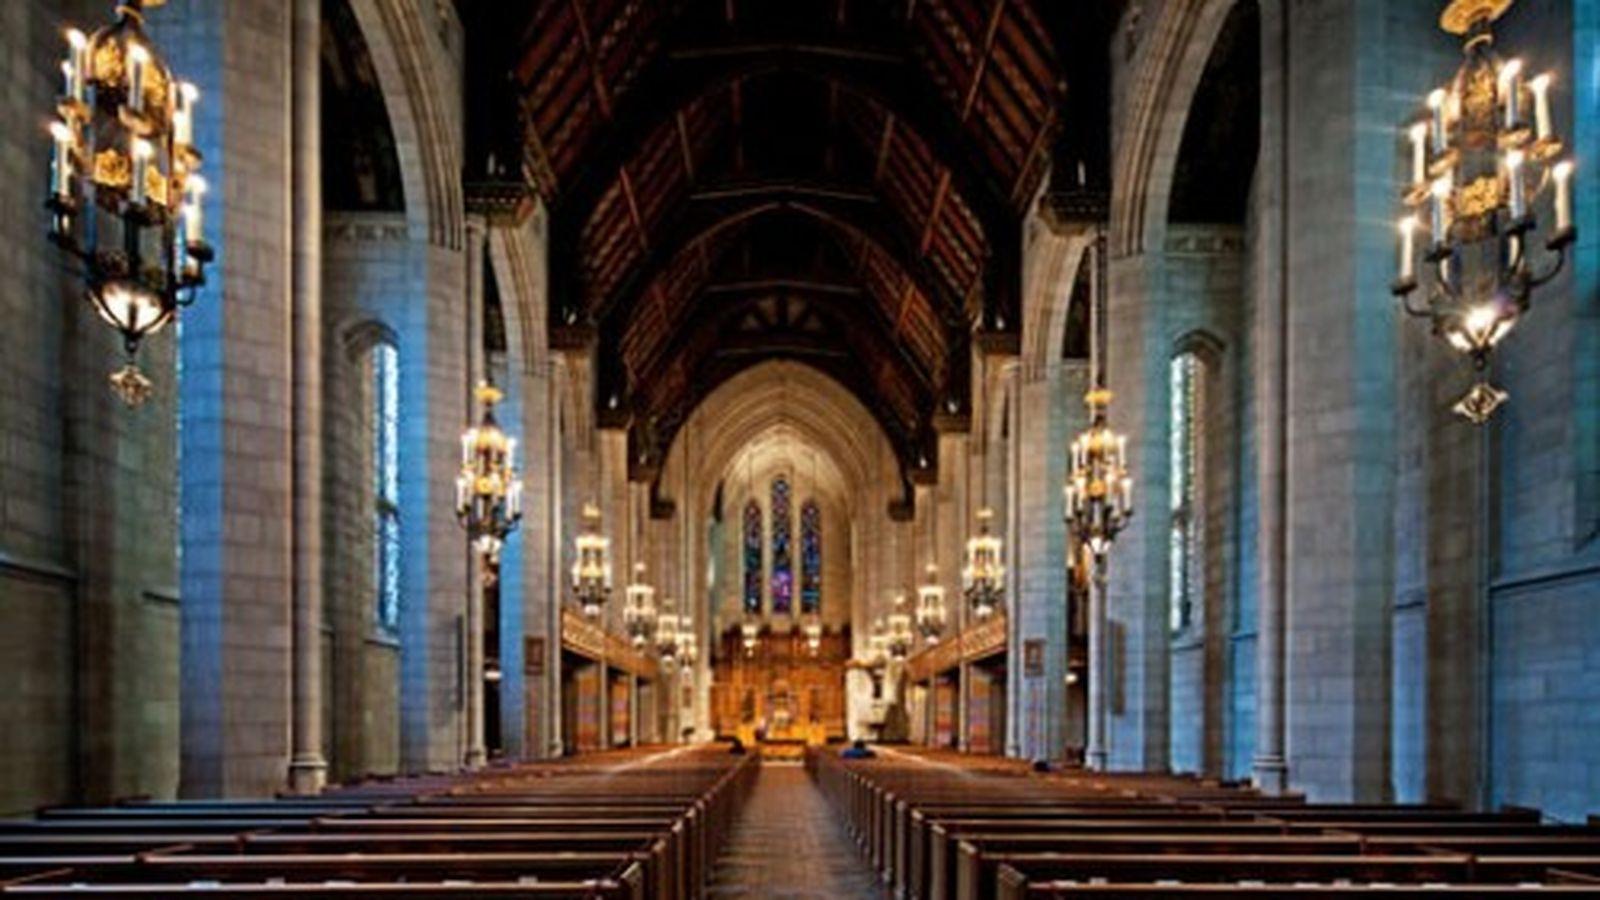 Interior Fourth Presbyterian Church of Chicago